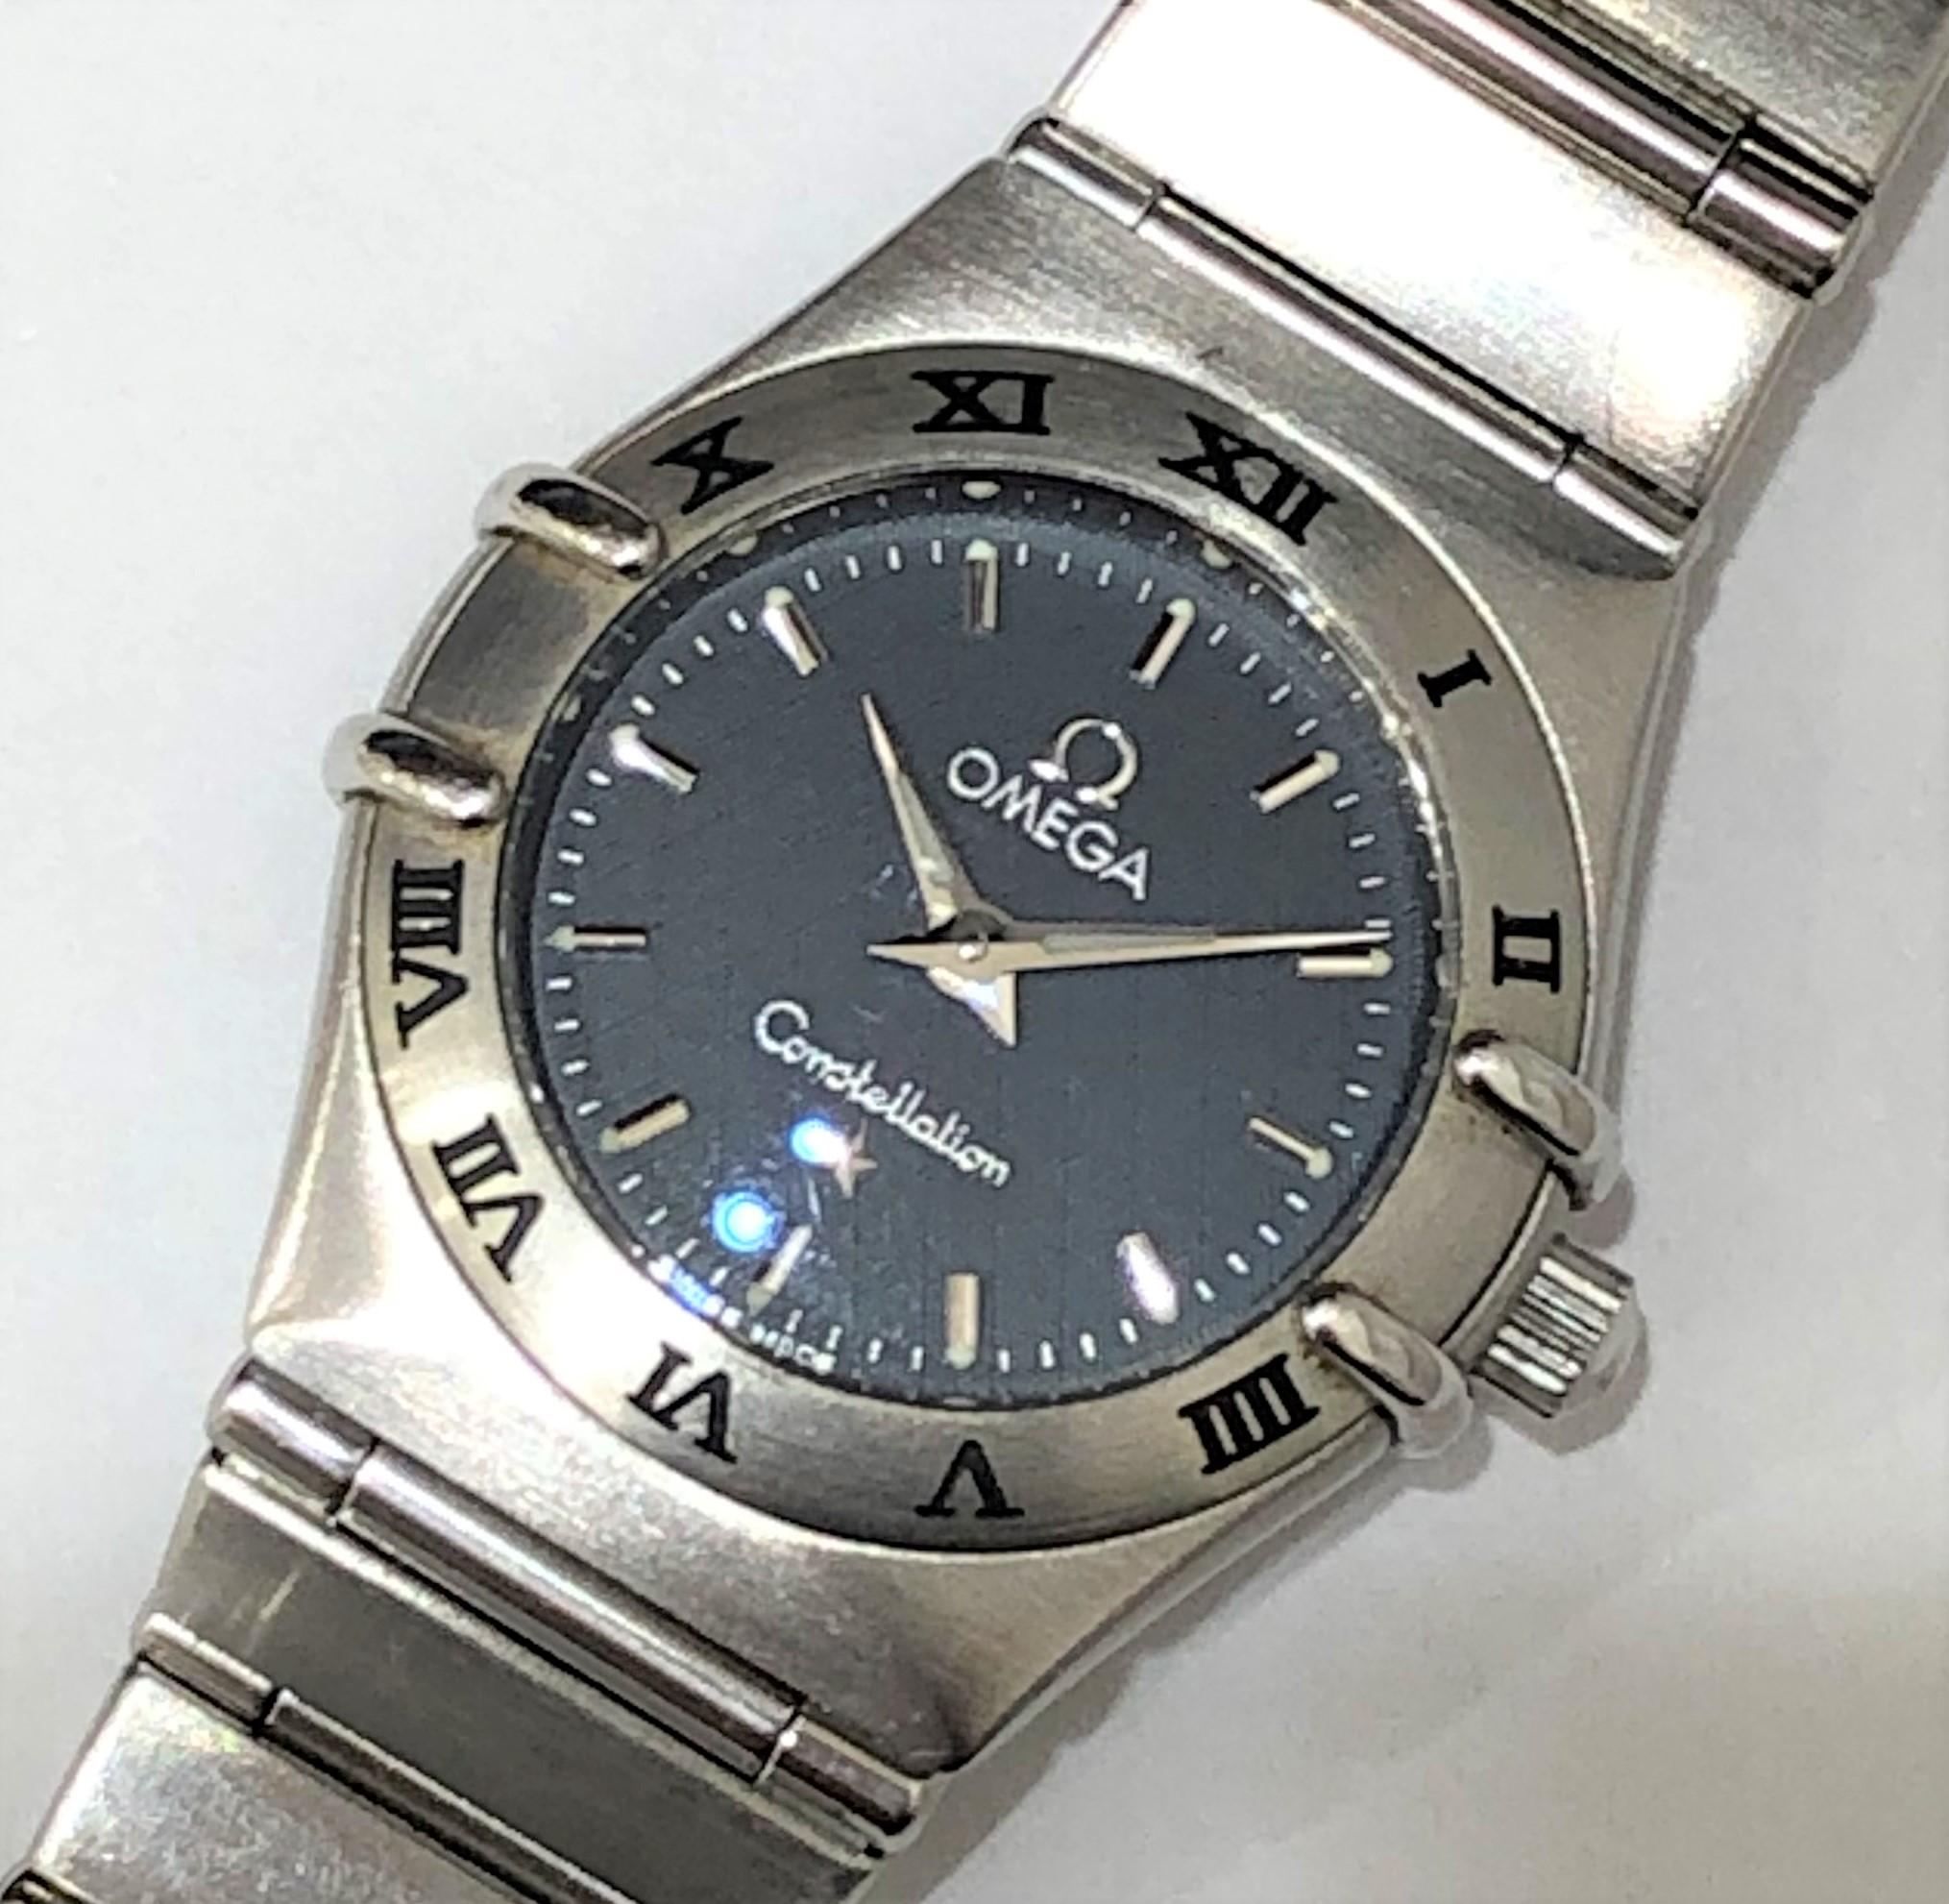 【OMEGA/オメガ】コンステレーション レディース 1562.40 QZ 腕時計